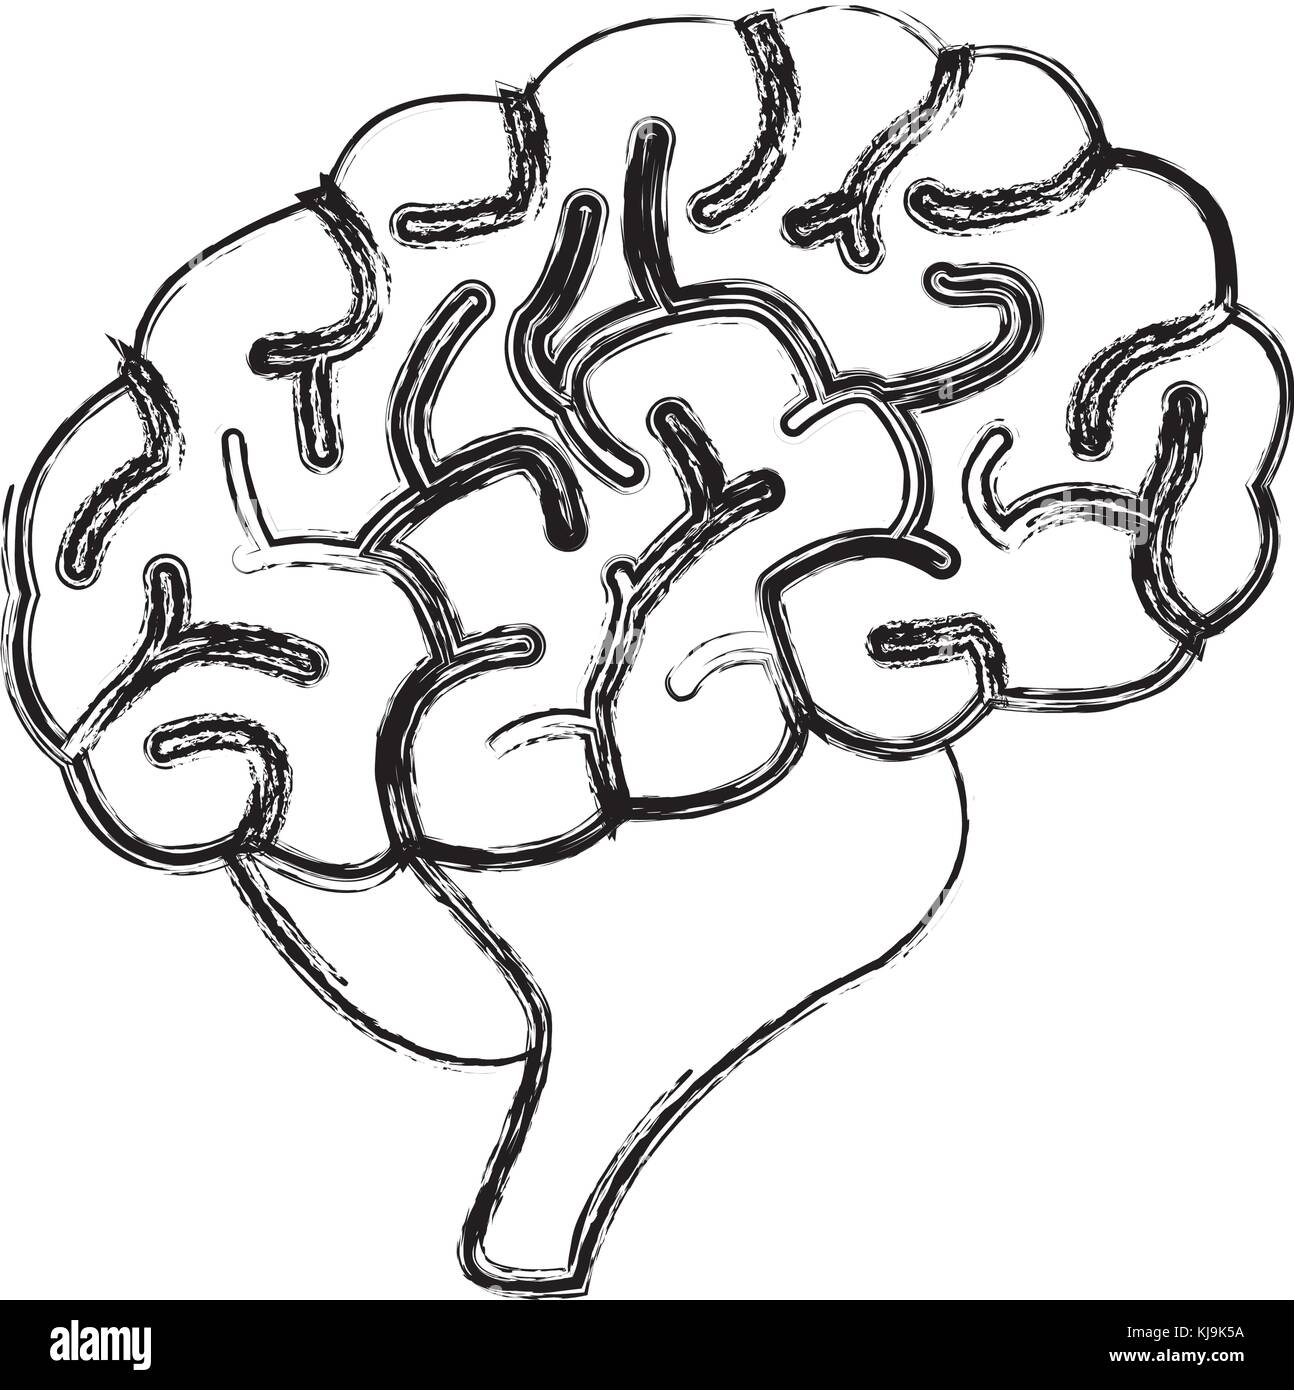 Human brain symbol stock vector art illustration vector image human brain symbol biocorpaavc Images